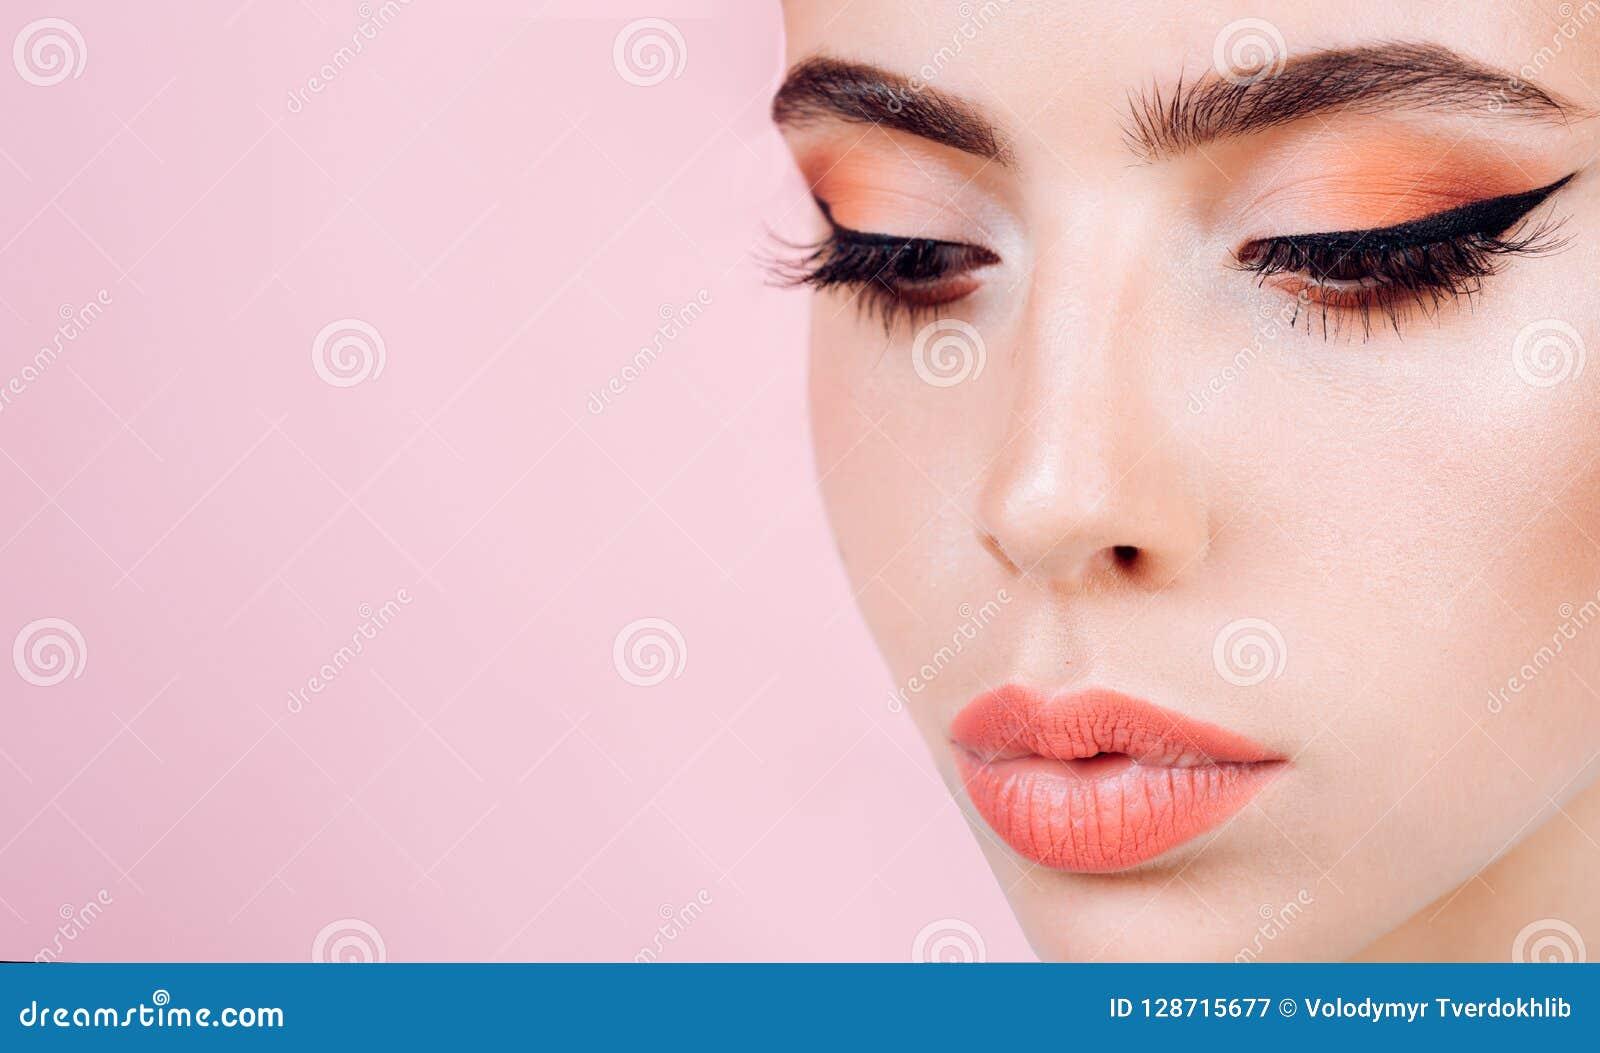 Nailfile καρφιά ομορφιάς που γυαλίζουν το σαλόνι Αναδρομική γυναίκα με τη μόδα makeup girl pin up εκλεκτής ποιότητας γυναίκα με τ